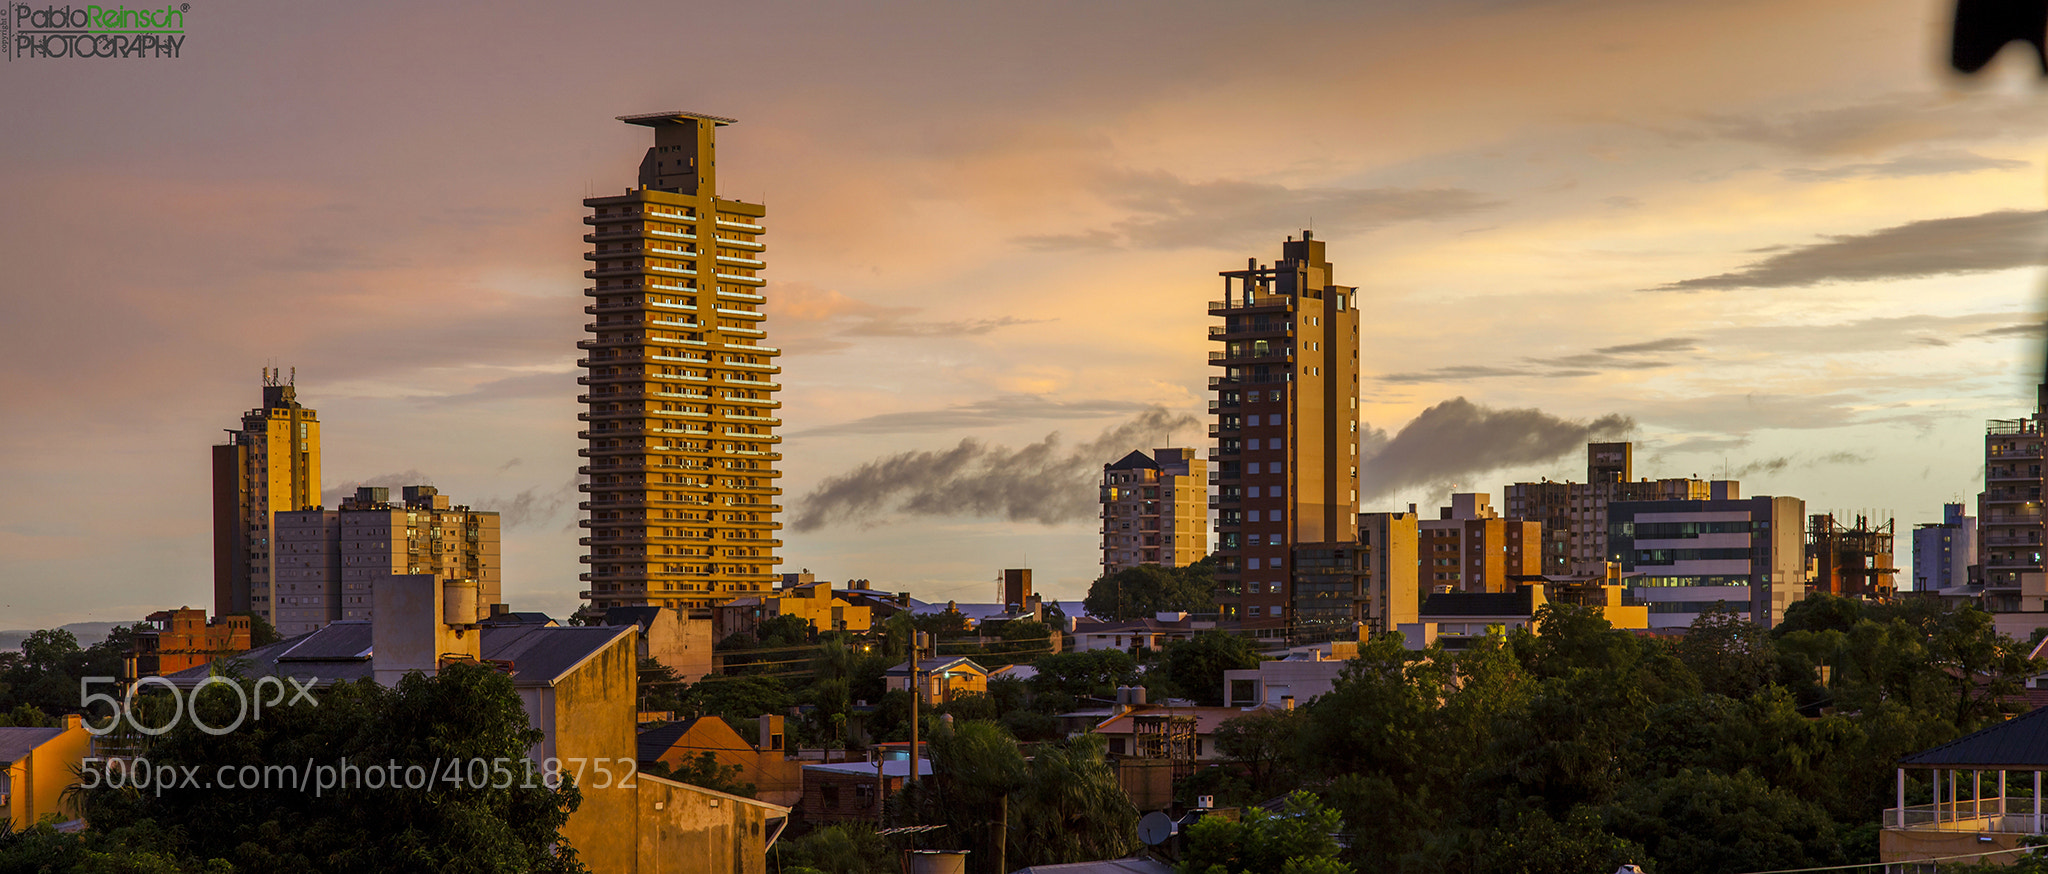 Photograph Paisaje urbano.- by Pablo Reinsch on 500px